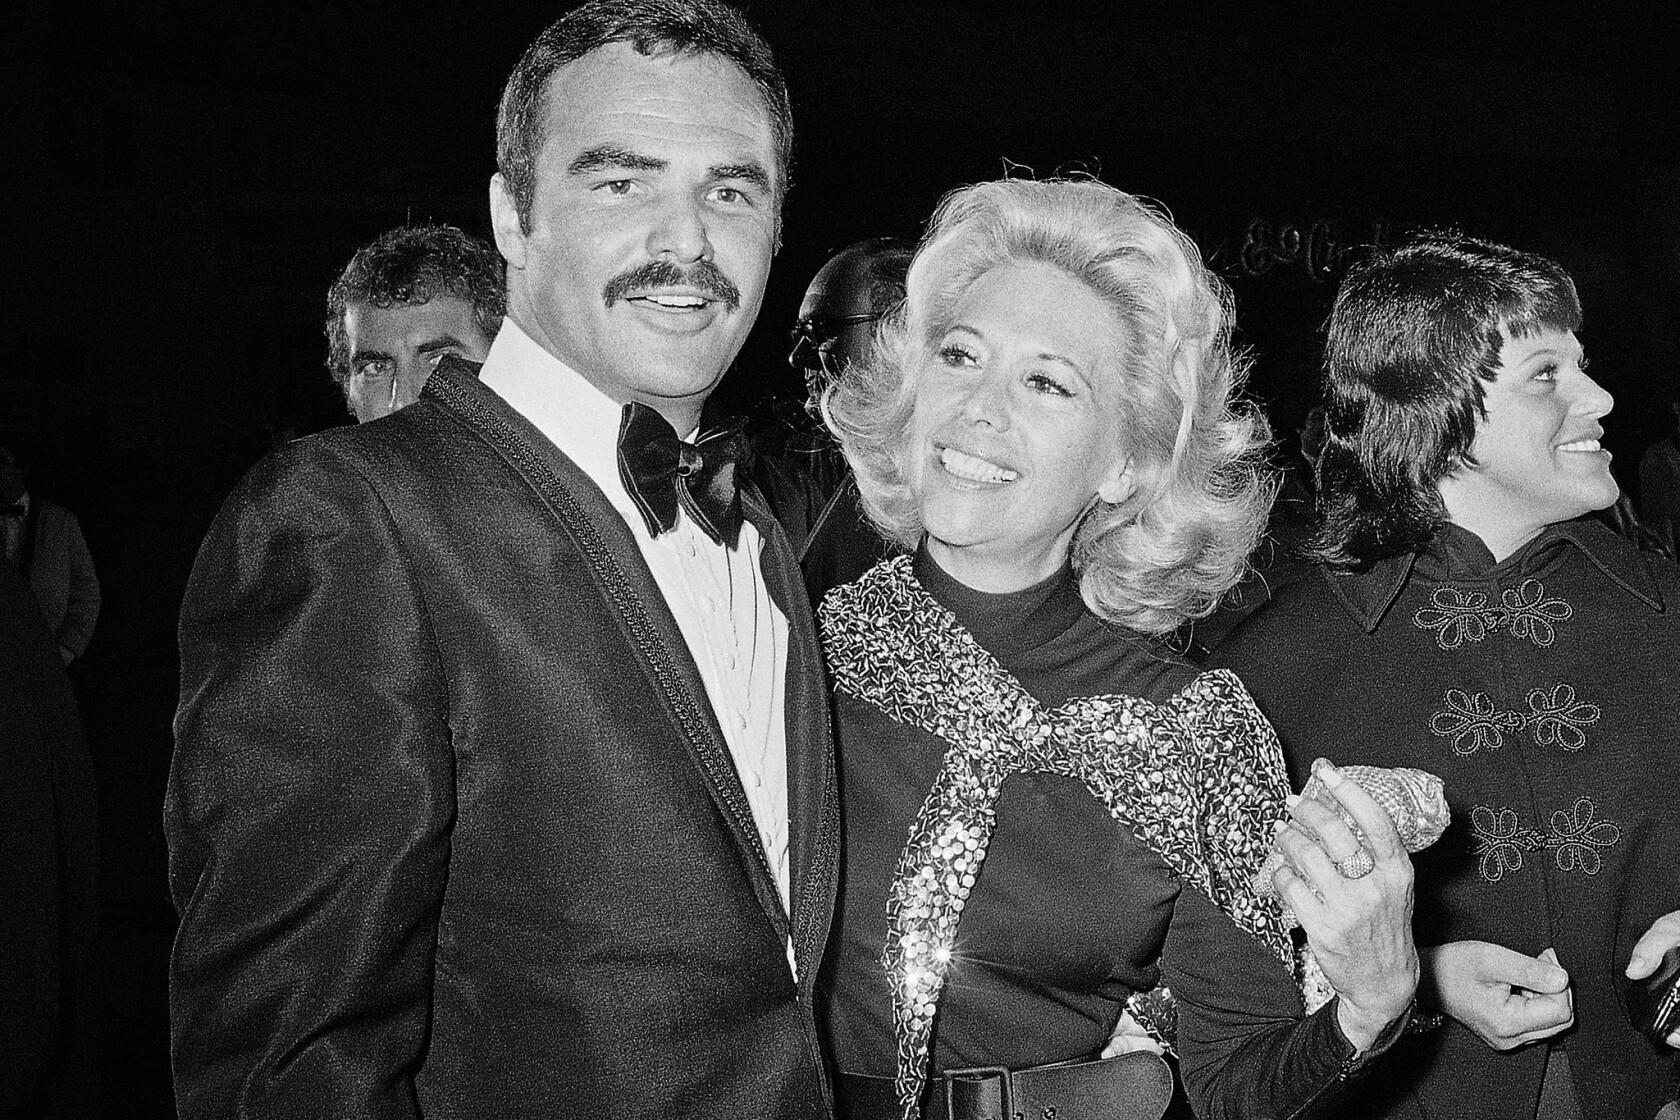 Burt Reynolds is the comeback kid - Los Angeles Times